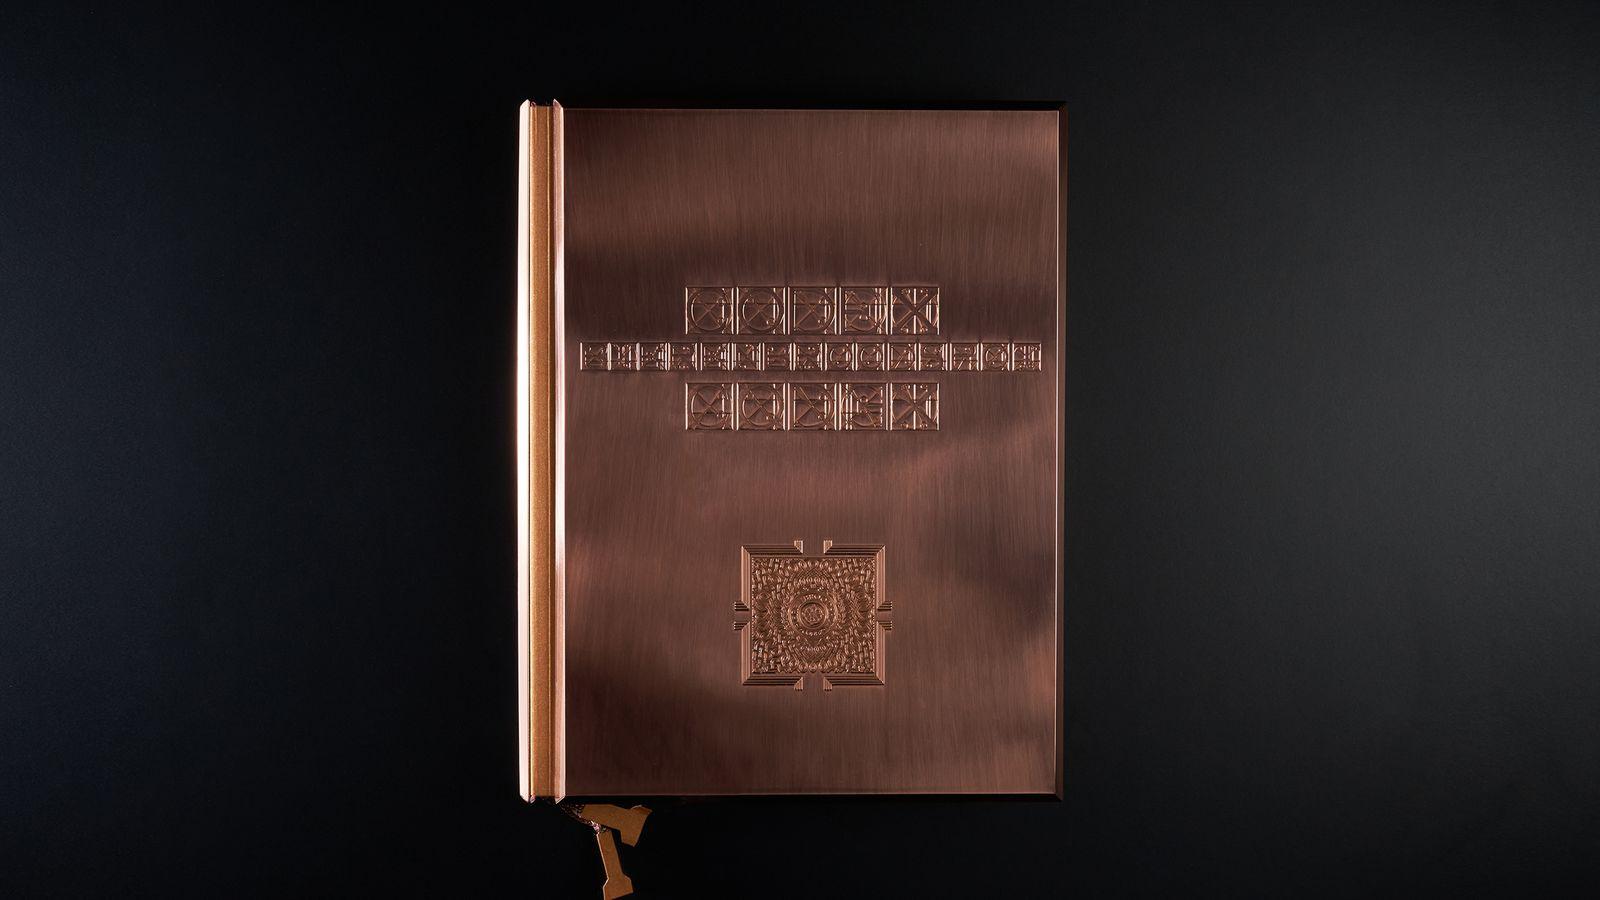 Codex Bierenbroodspot - cover.jpg